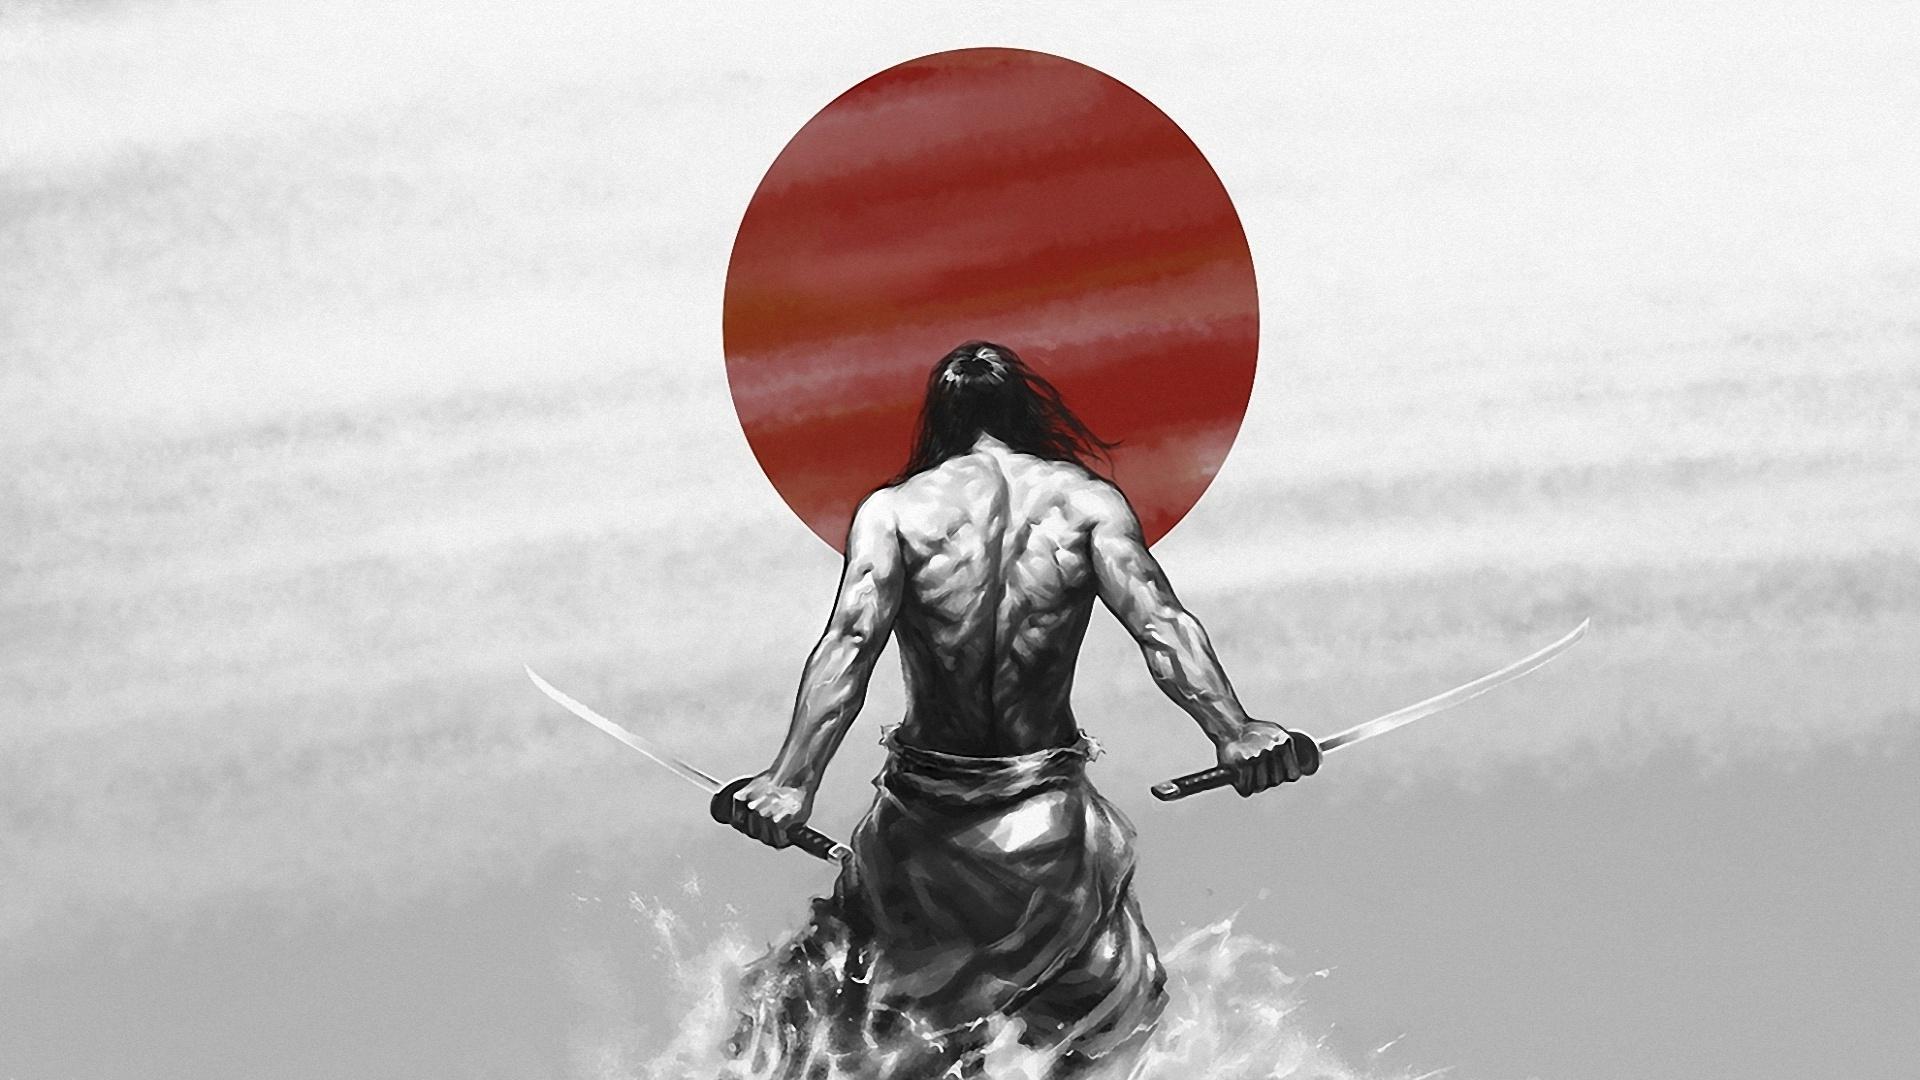 samurai wallpaper 1920x1080 1920x1080